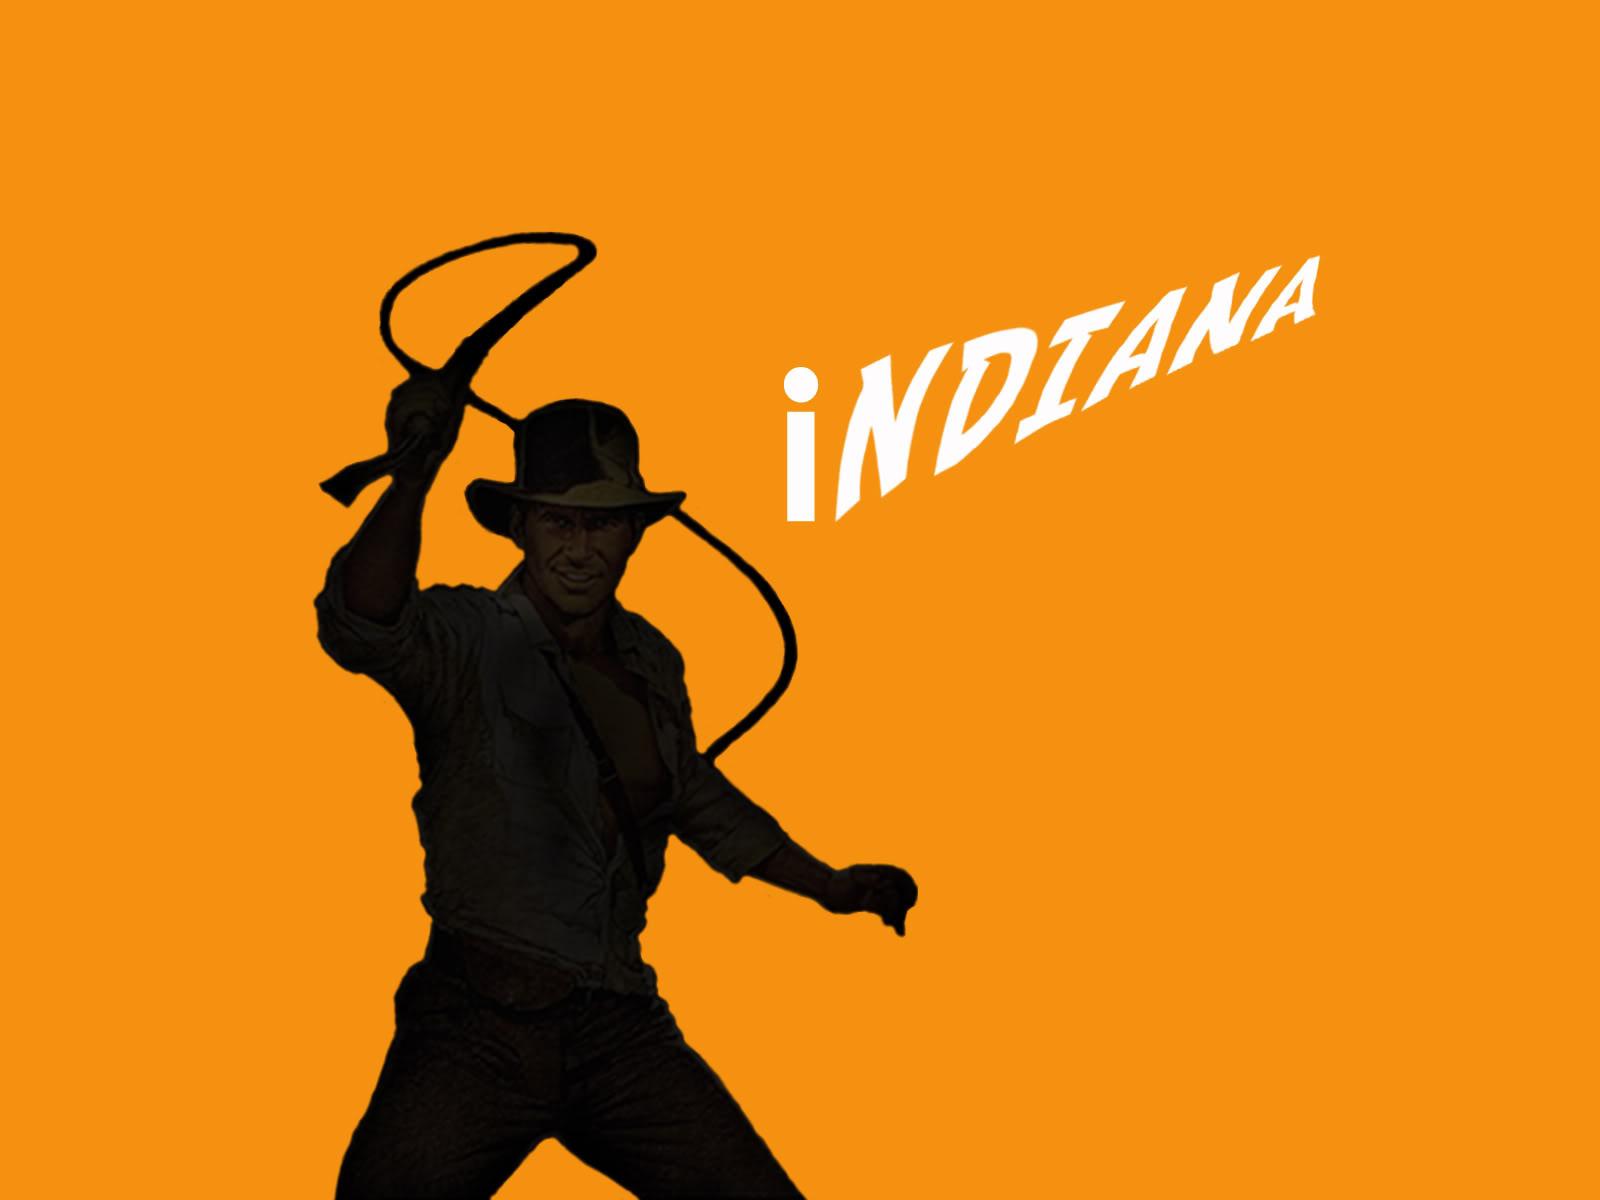 1600x1200 Photo Indiana.jpg Art Projects Indiana Jones